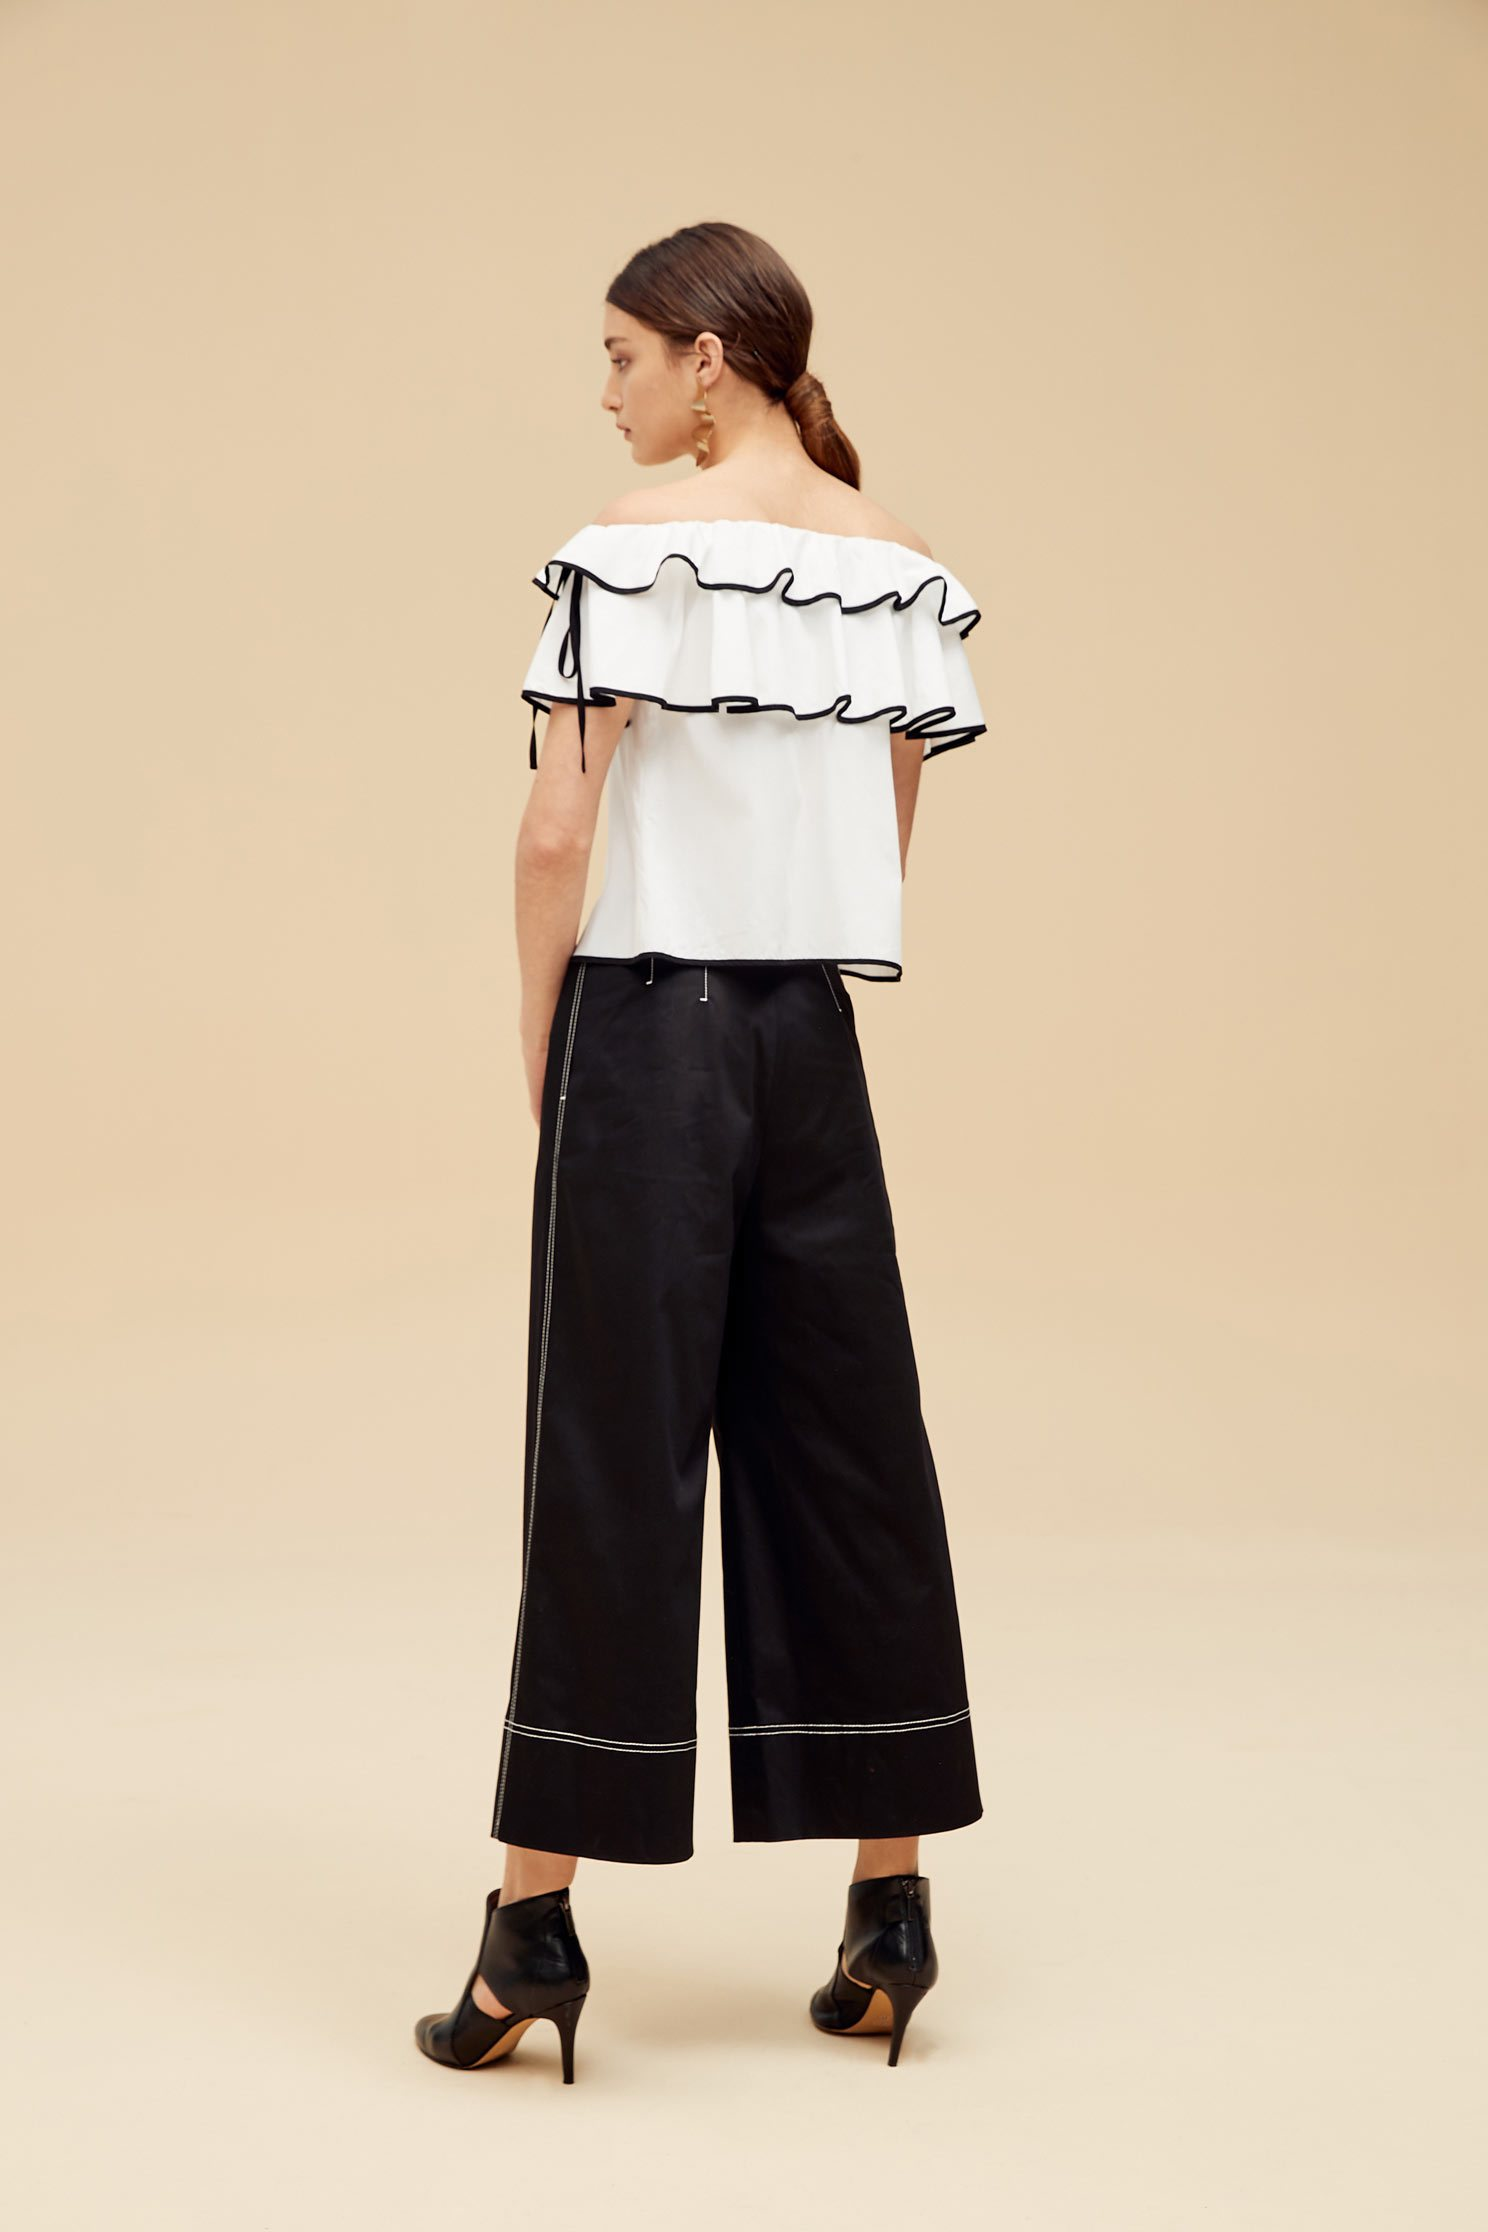 Stringy selvedge top,Off shoulder Top,Top,Rayon,Off Shoulder Top,白色上衣,短袖上衣